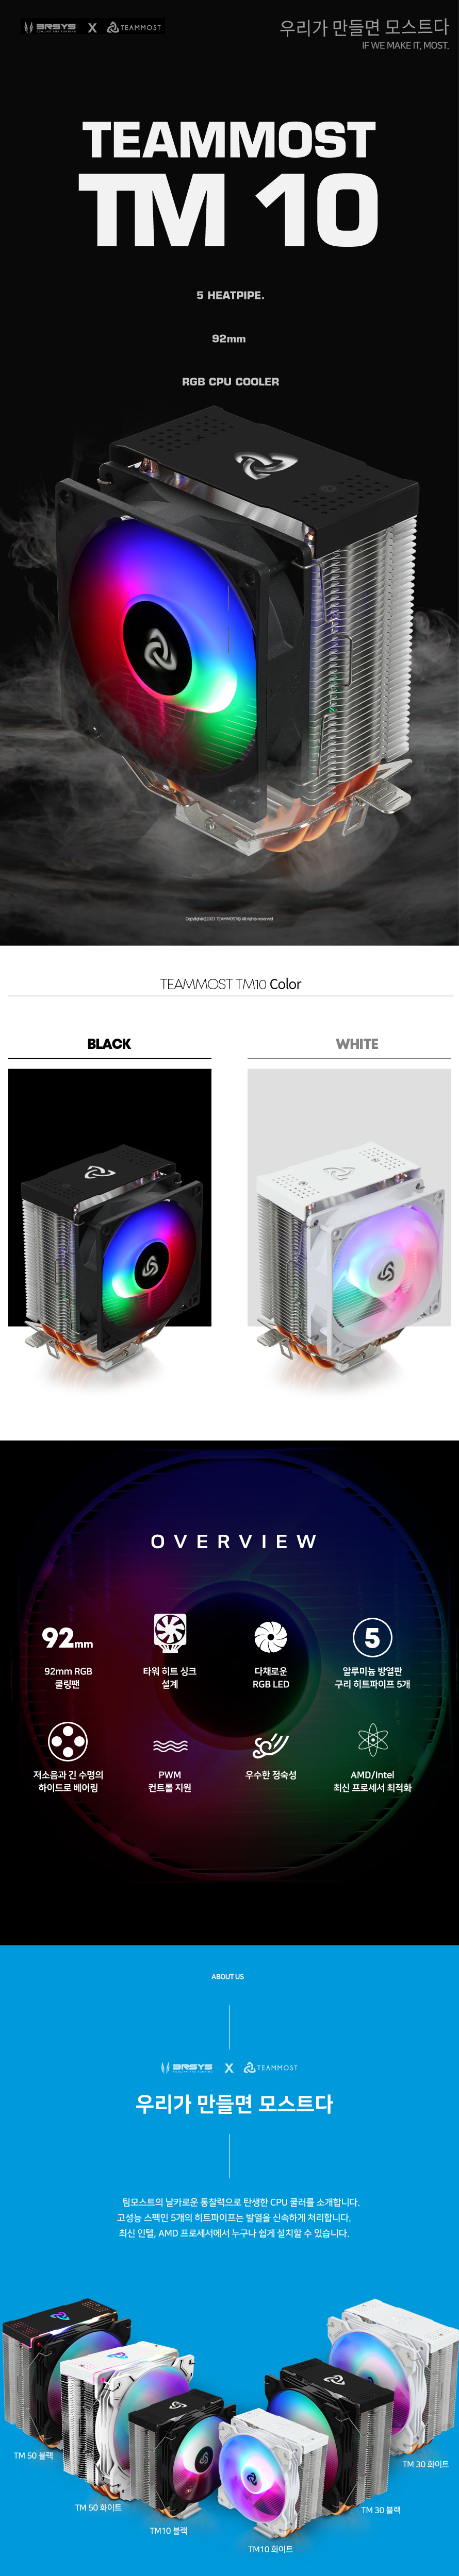 3RSYS TEAMMOST TM-10 RGB (WHITE)